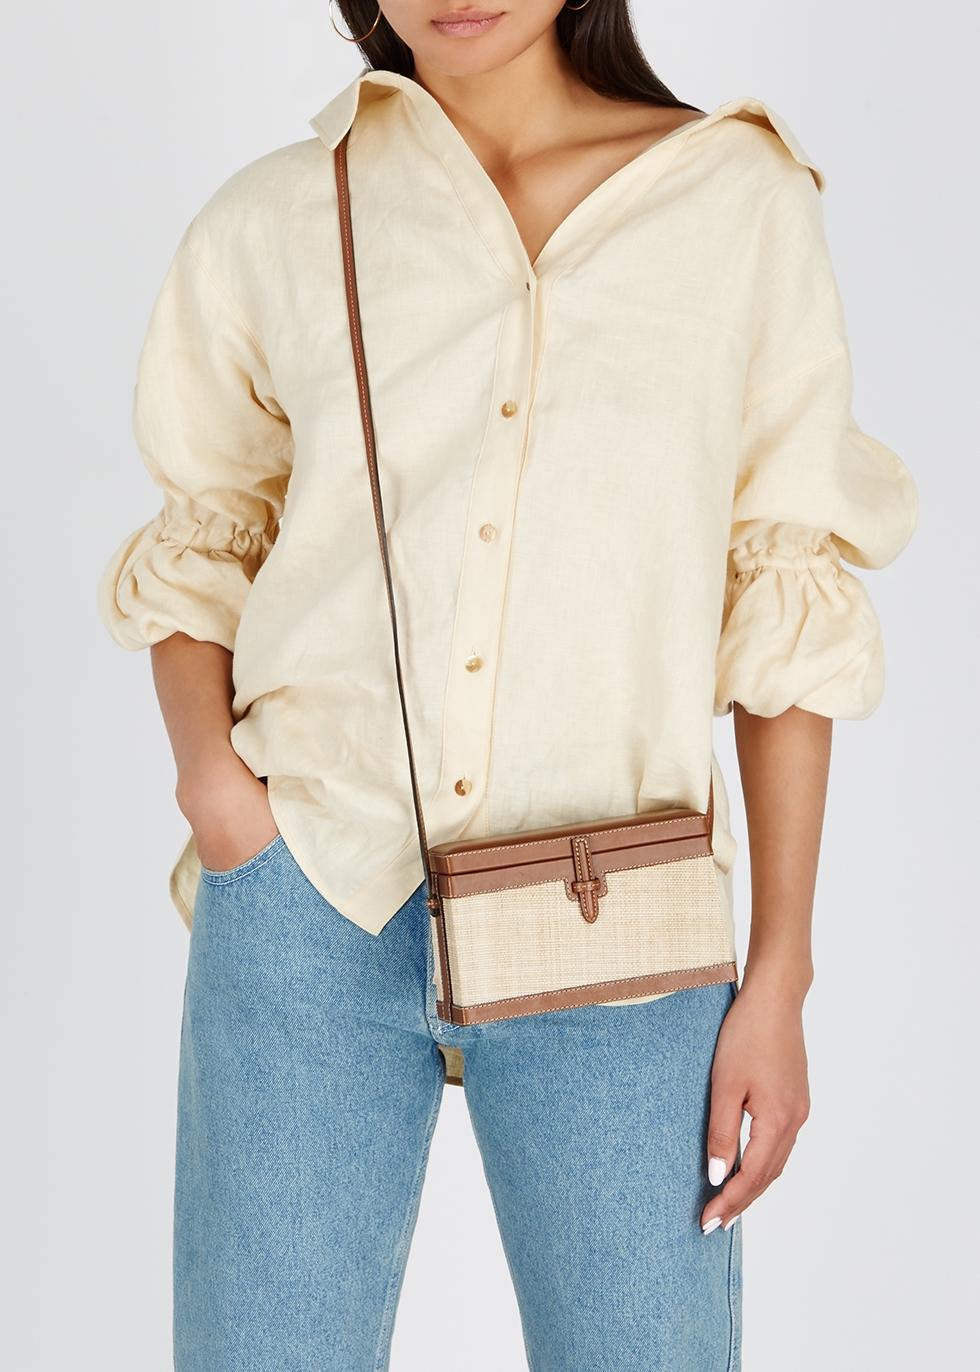 Brown leather and straw cross-body bag - Hunting Season